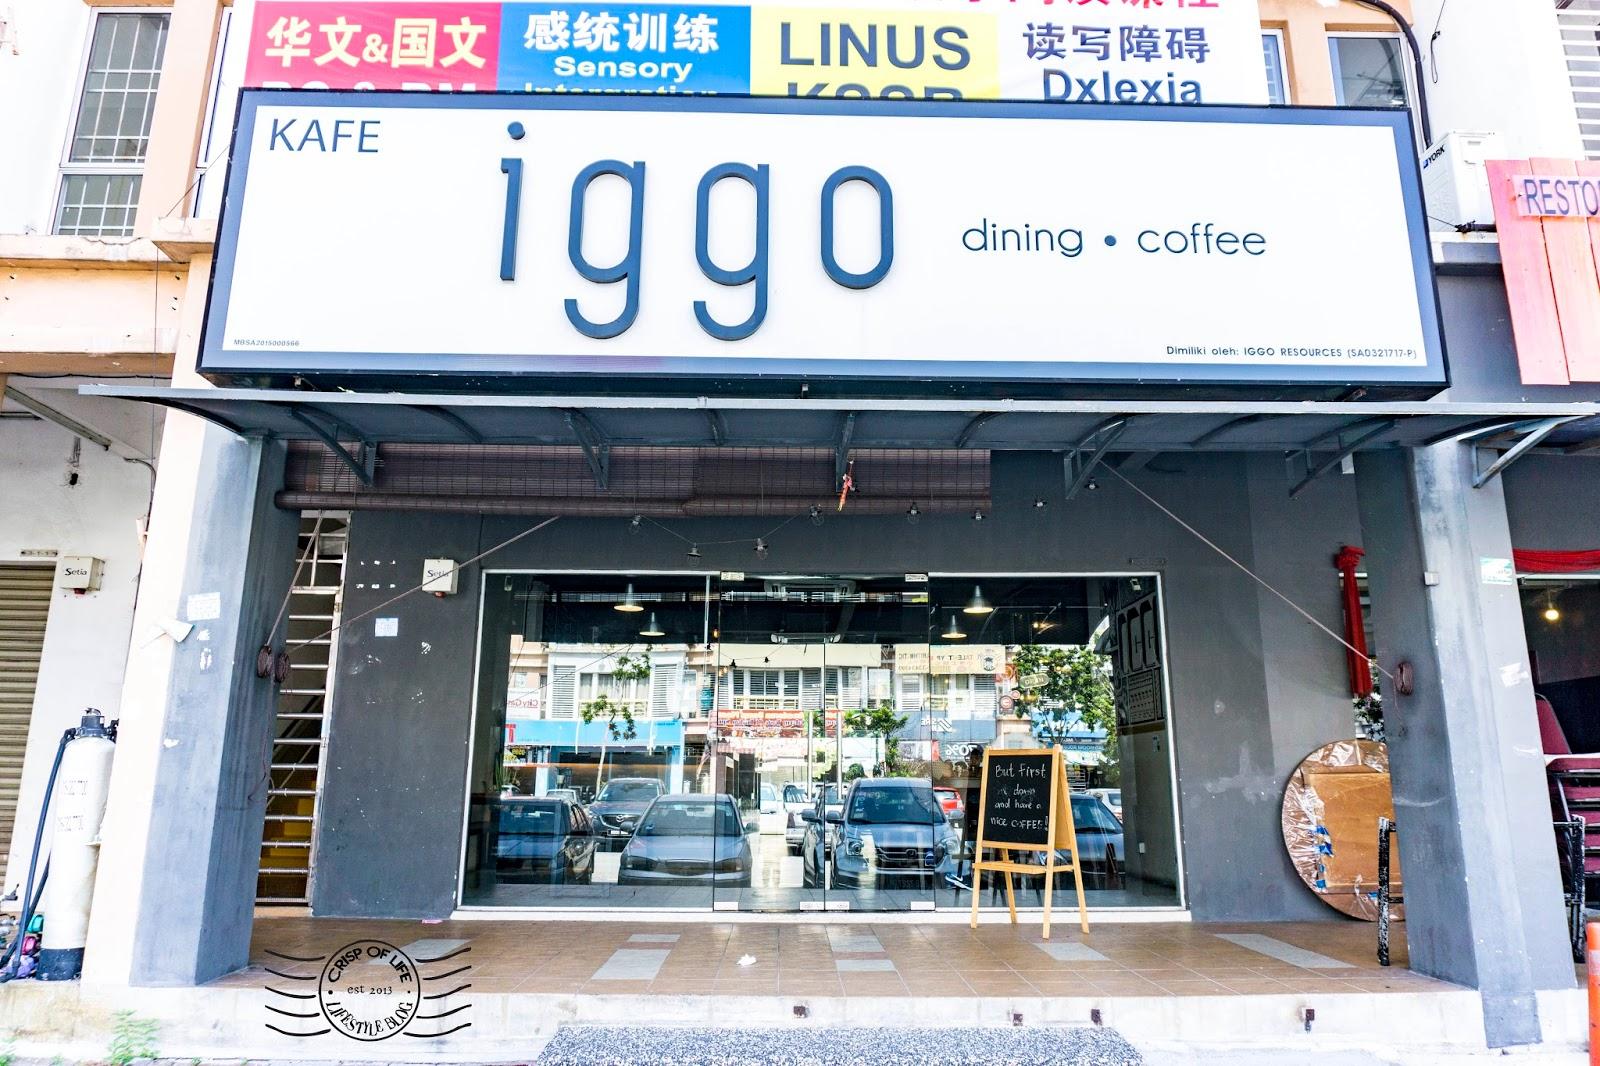 Cafe in Setia Alam, Selangor iggo Cafe